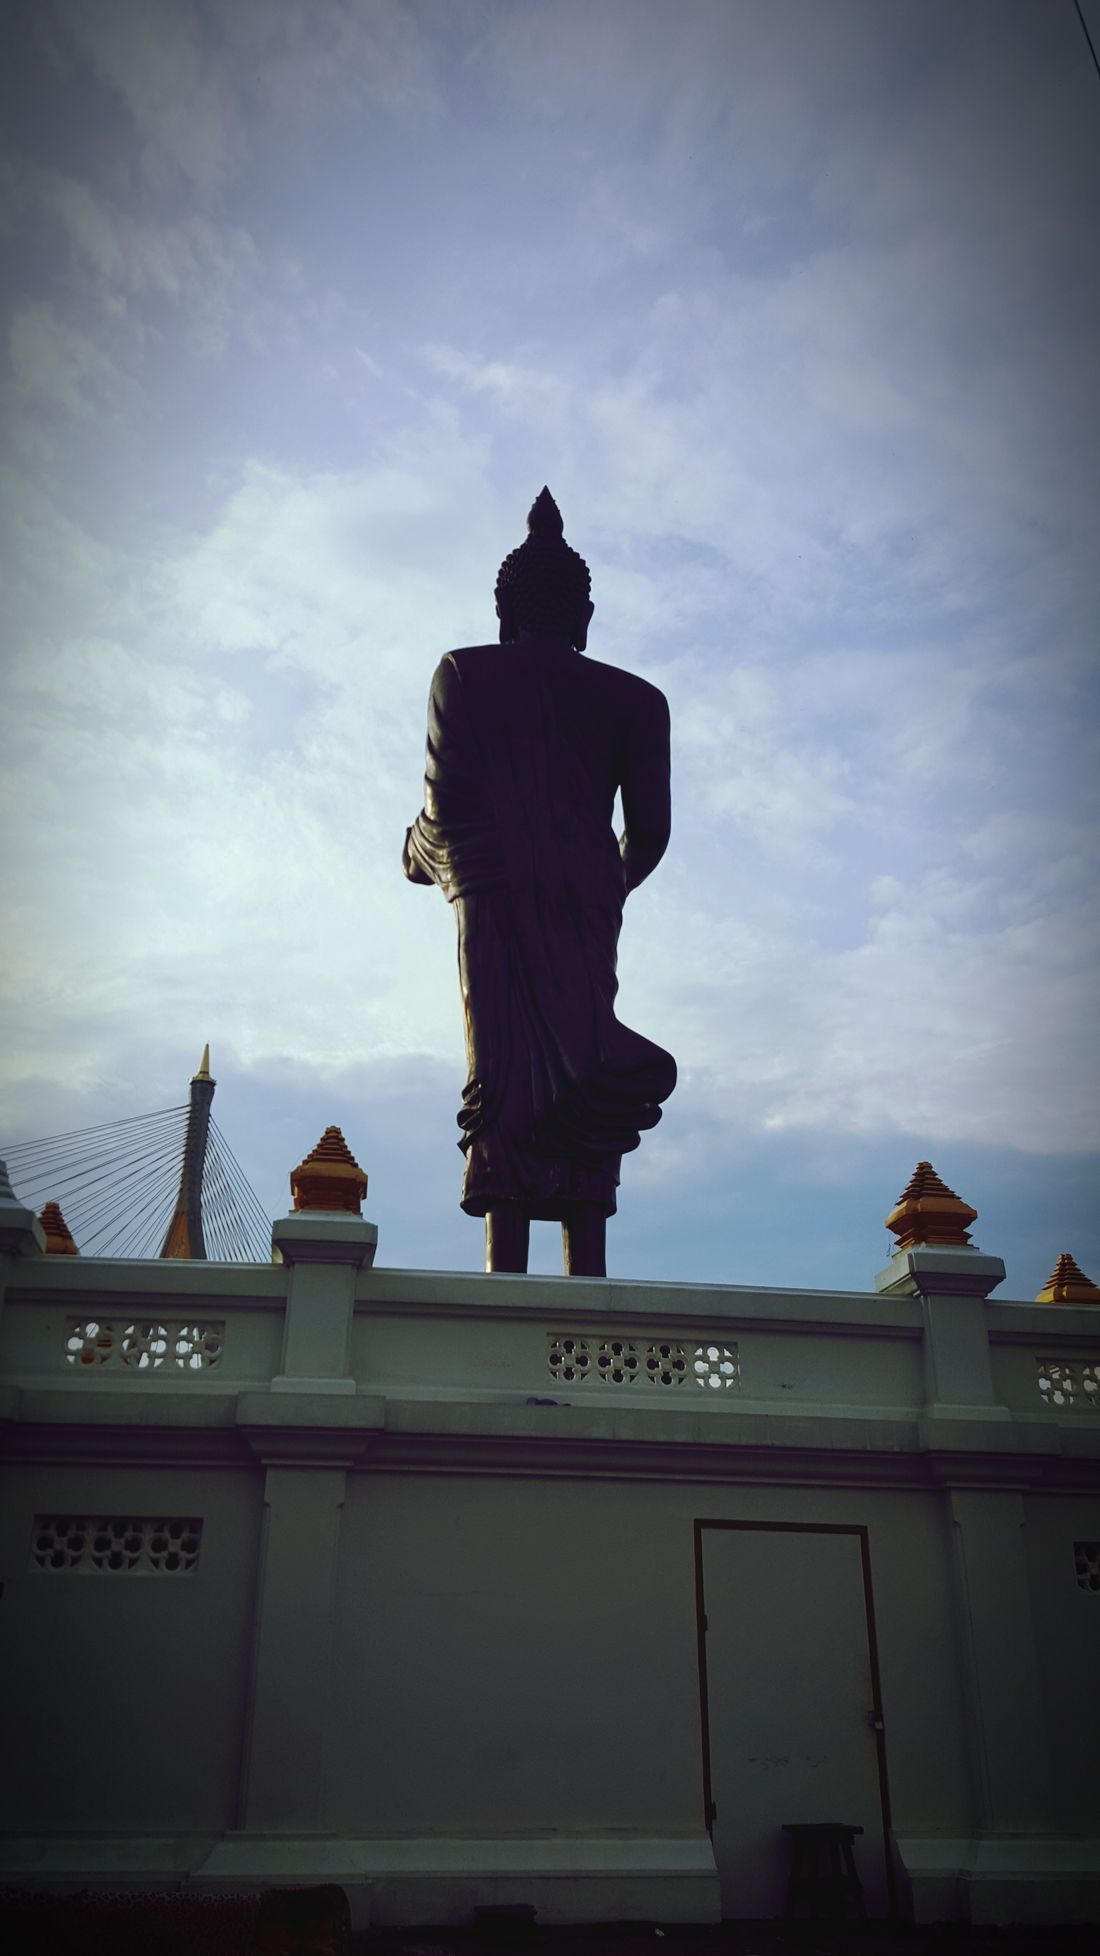 Back of Bhudda Bhuddist Bhuddha Thailand Bhudist Monk Thailand🇹🇭 Bhuddist Monestary Bhudha Statue